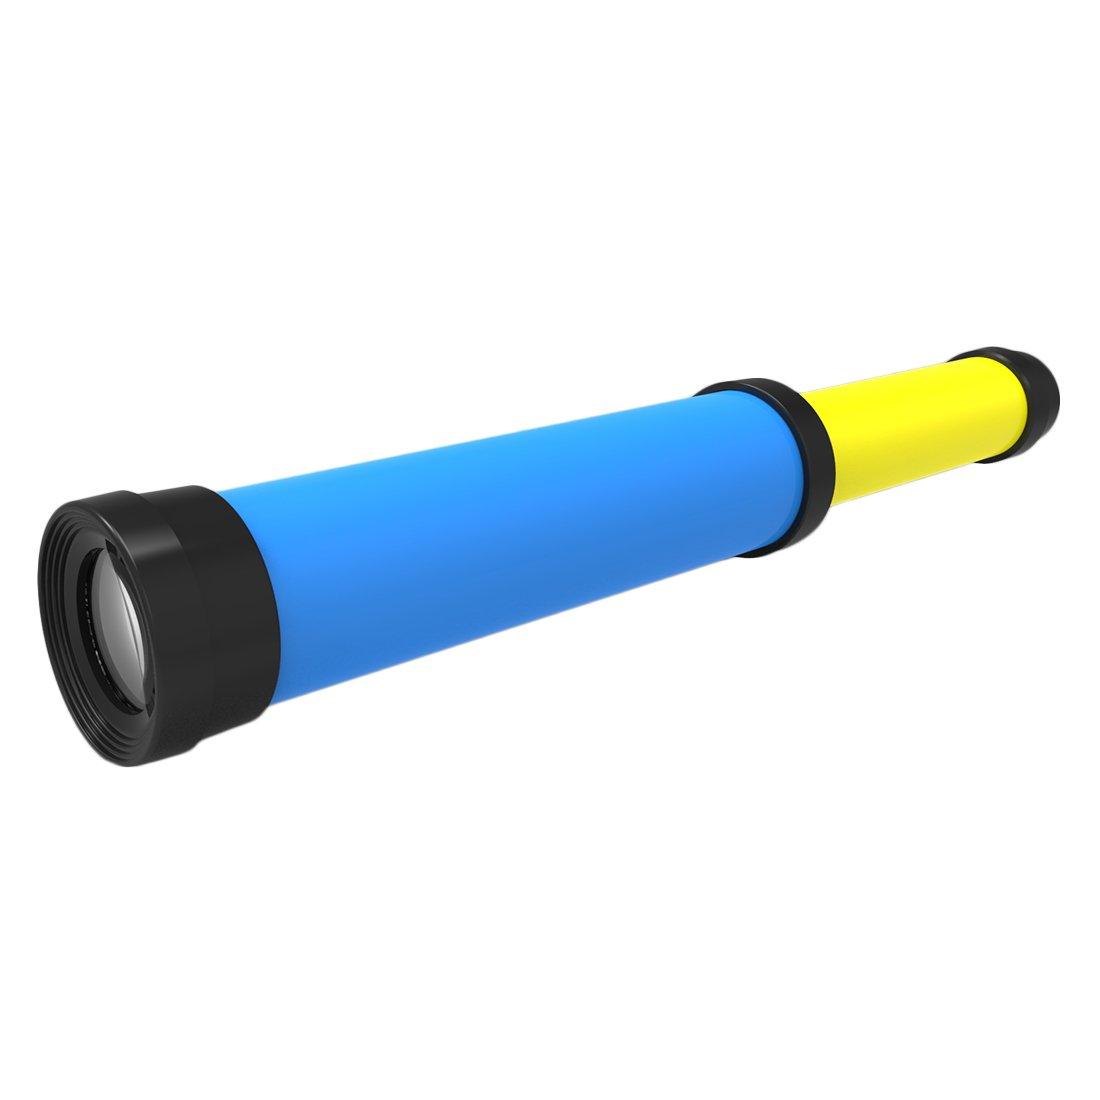 Lingxuinfo Telescope Experiment Science Kits Educational Toy for Kids